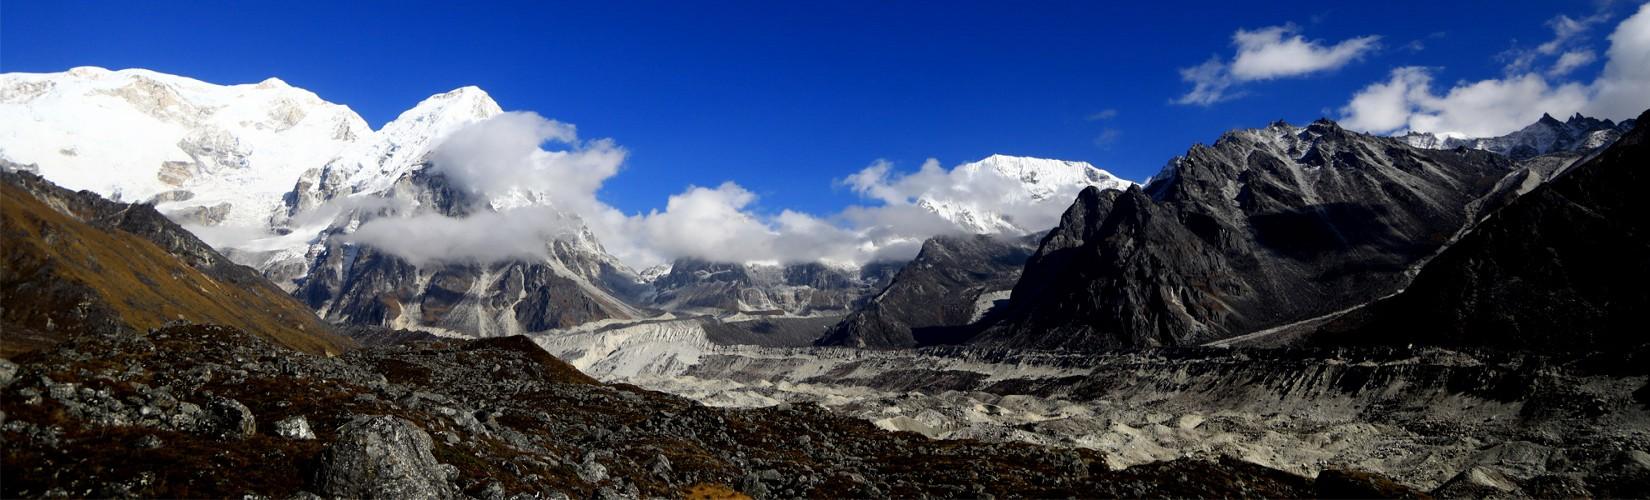 Kanchenjunga Region Nepal